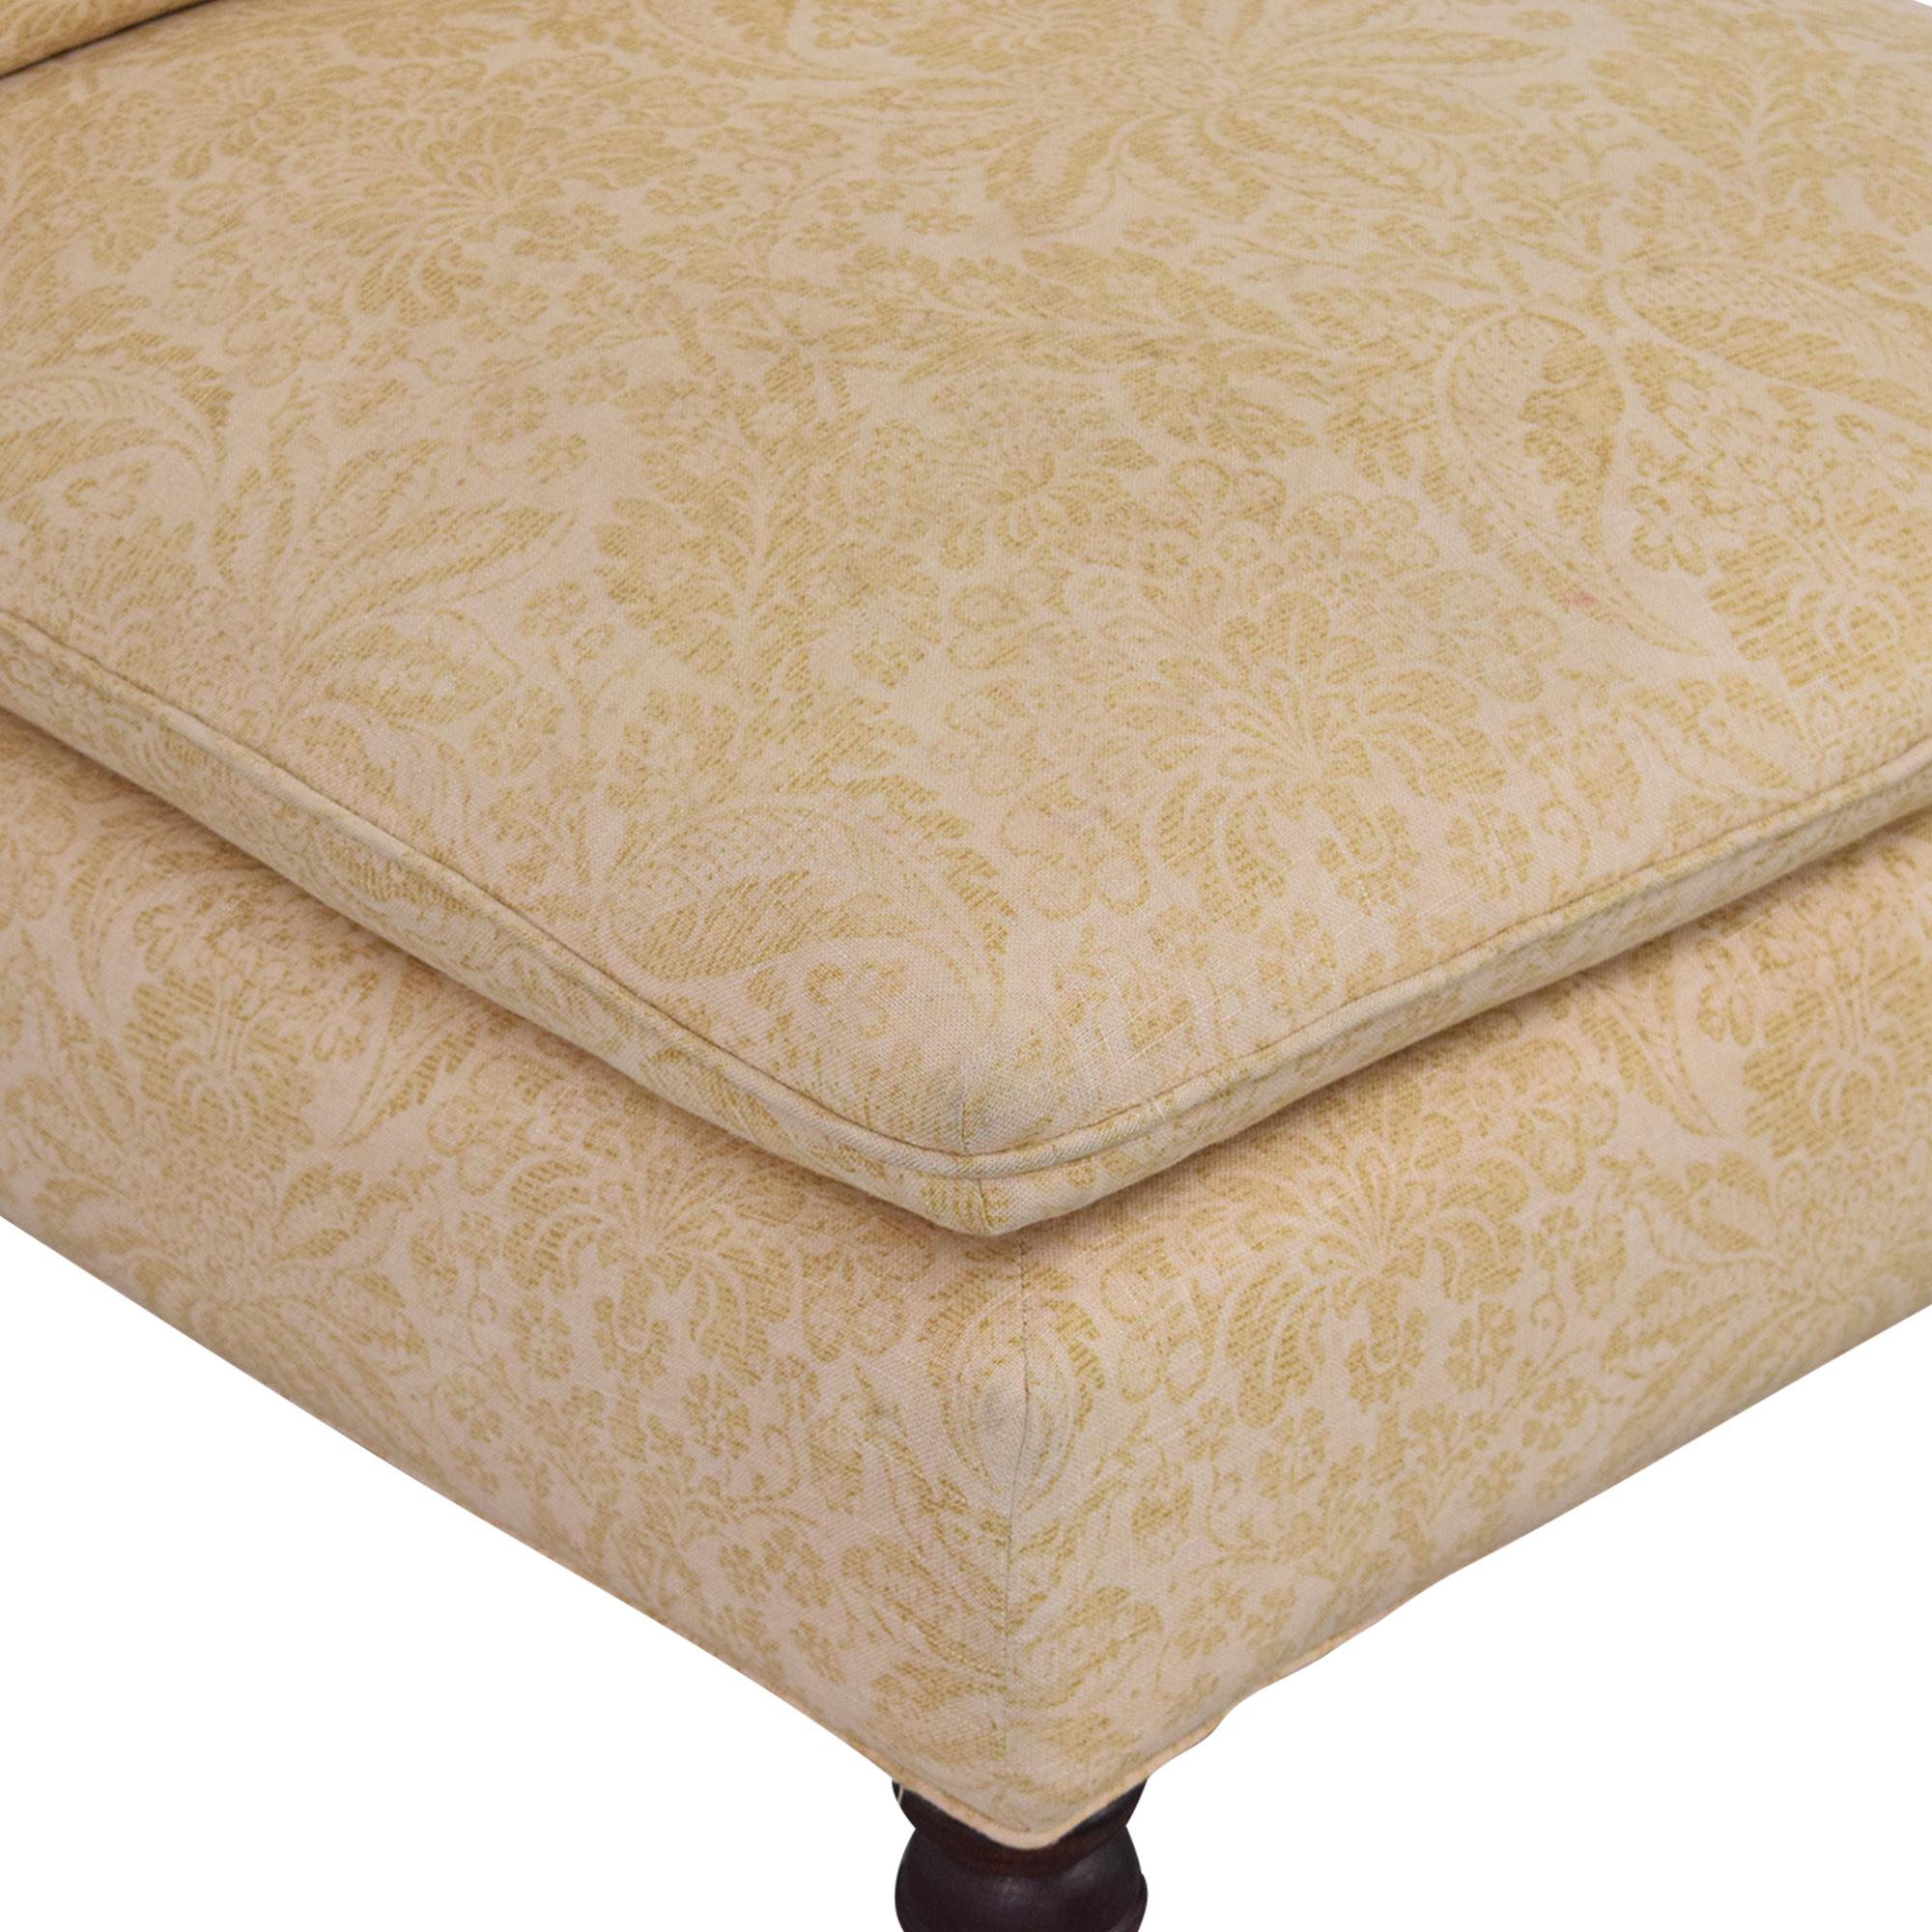 Mitchell Gold + Bob Williams Mitchell Gold + Bob Williams Lounge Chair second hand